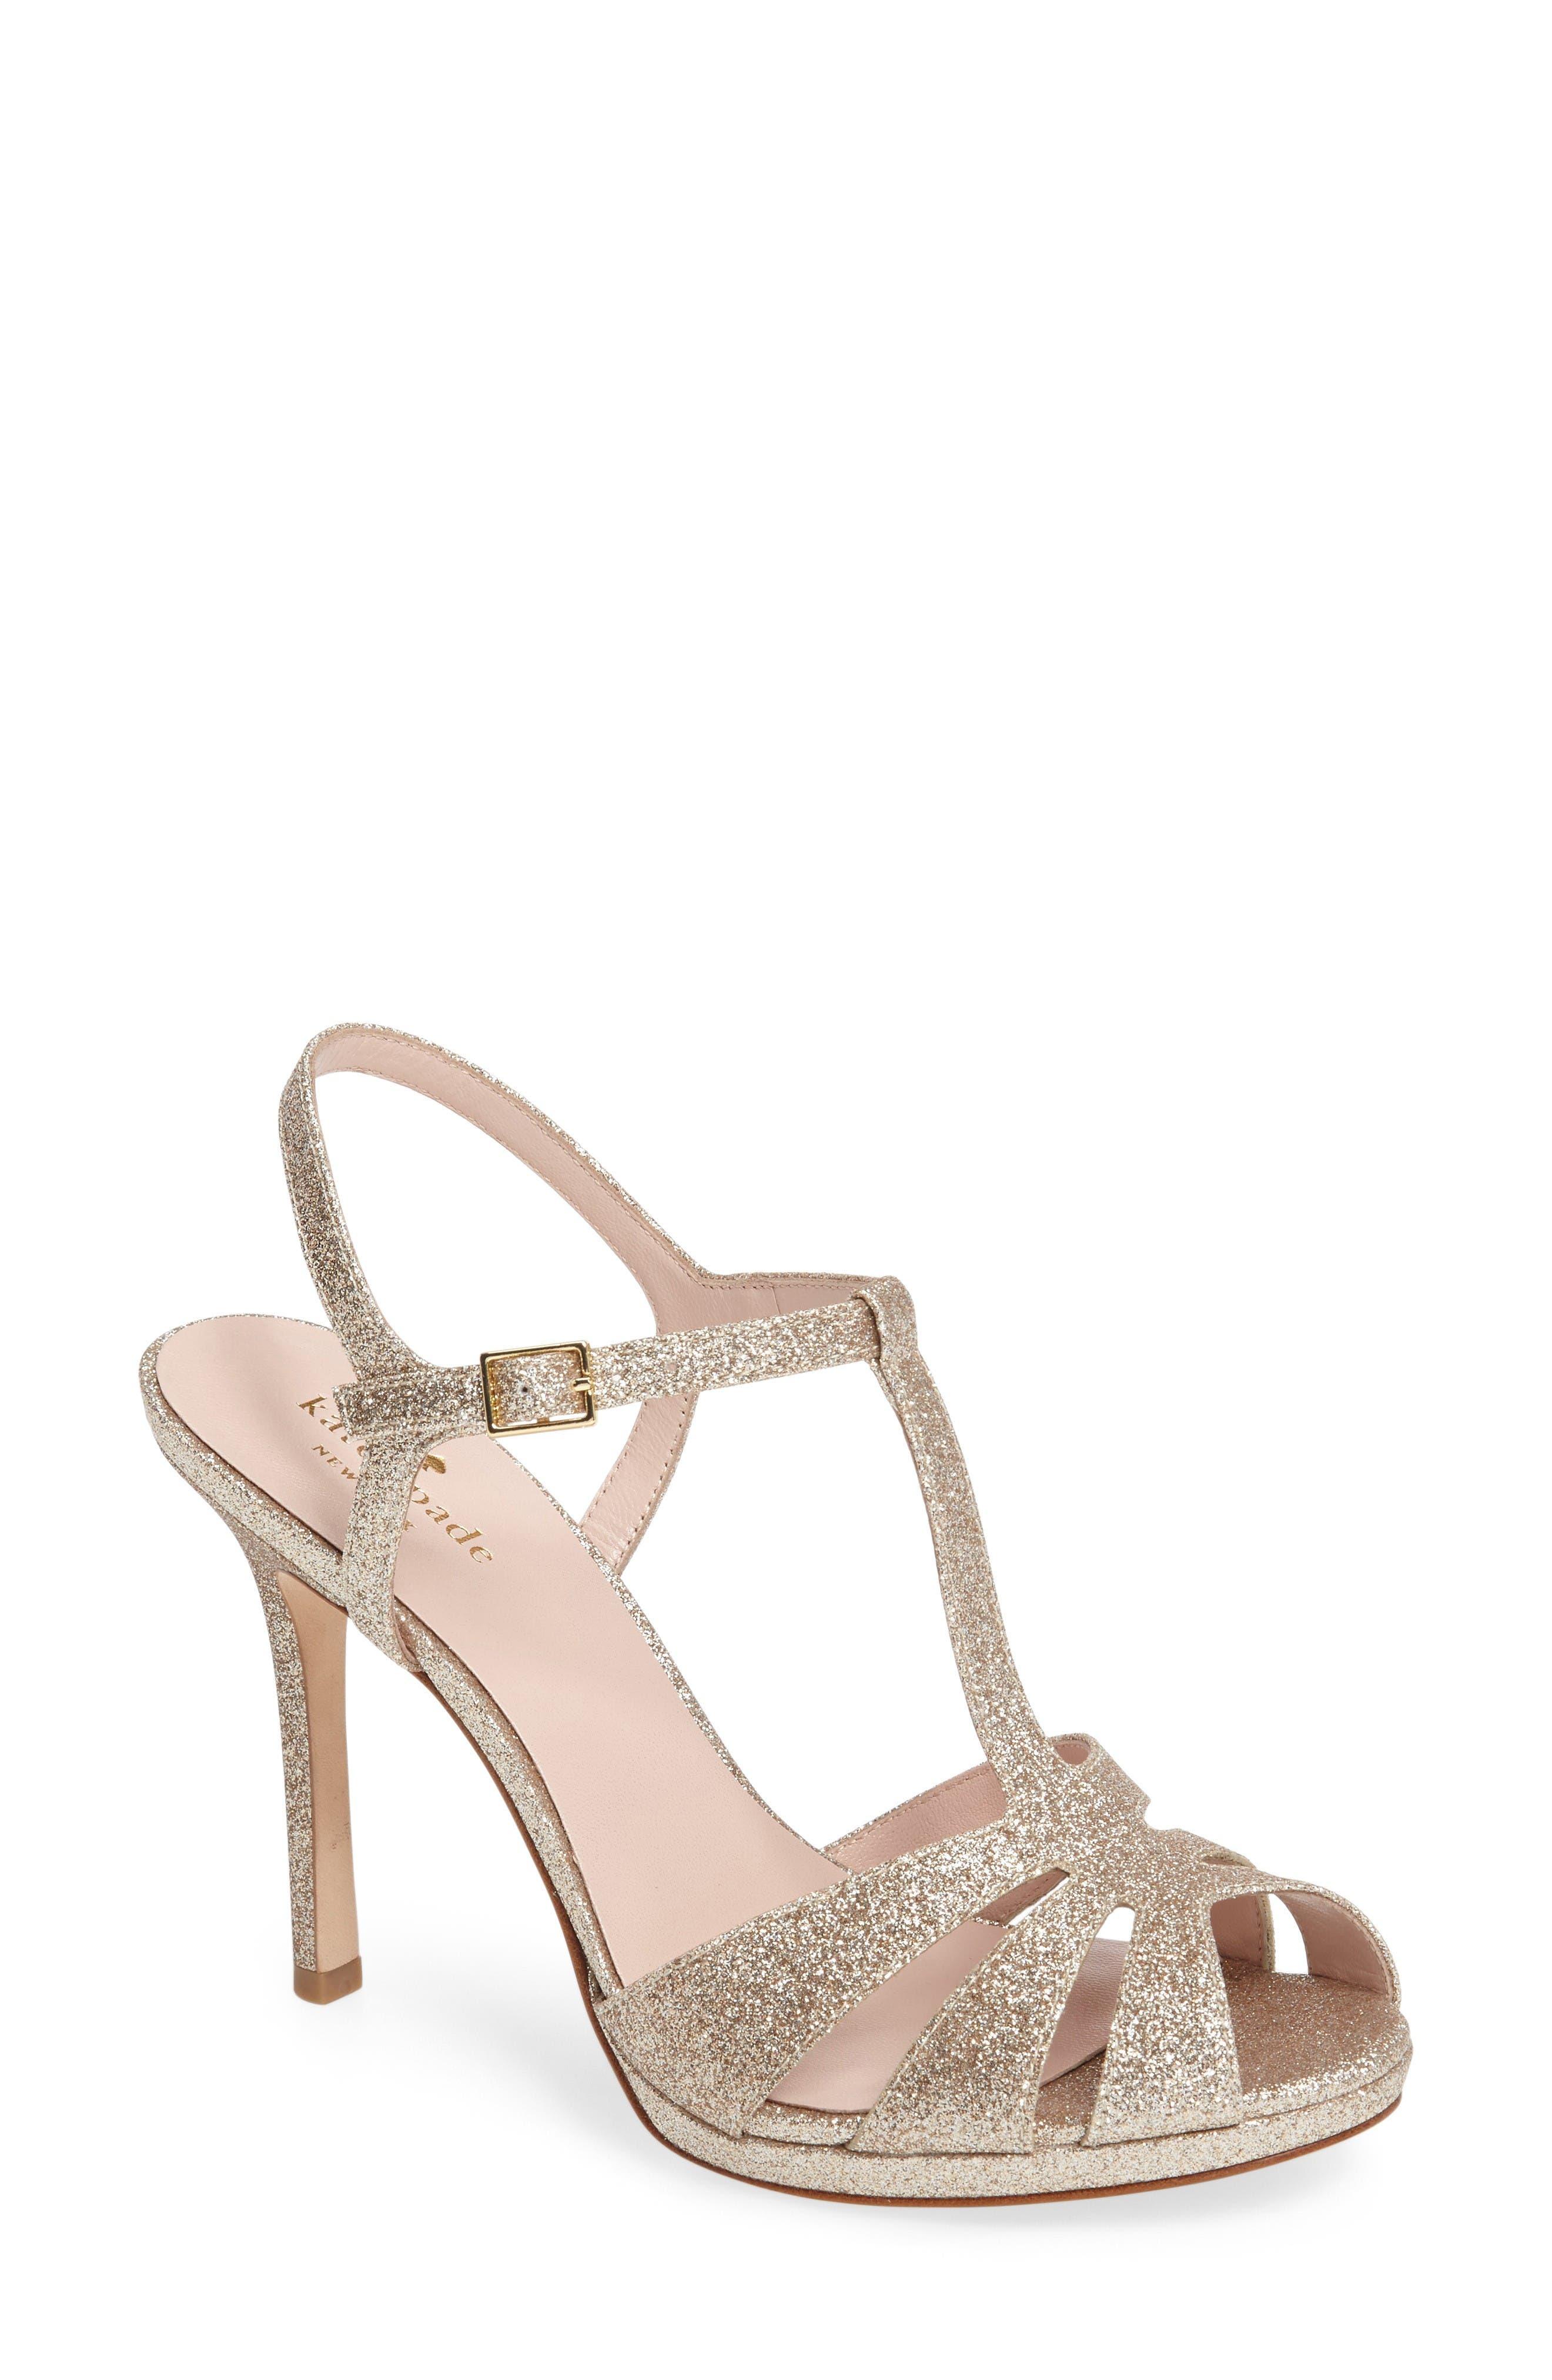 Main Image - kate spade new york feodora sandal (Women)